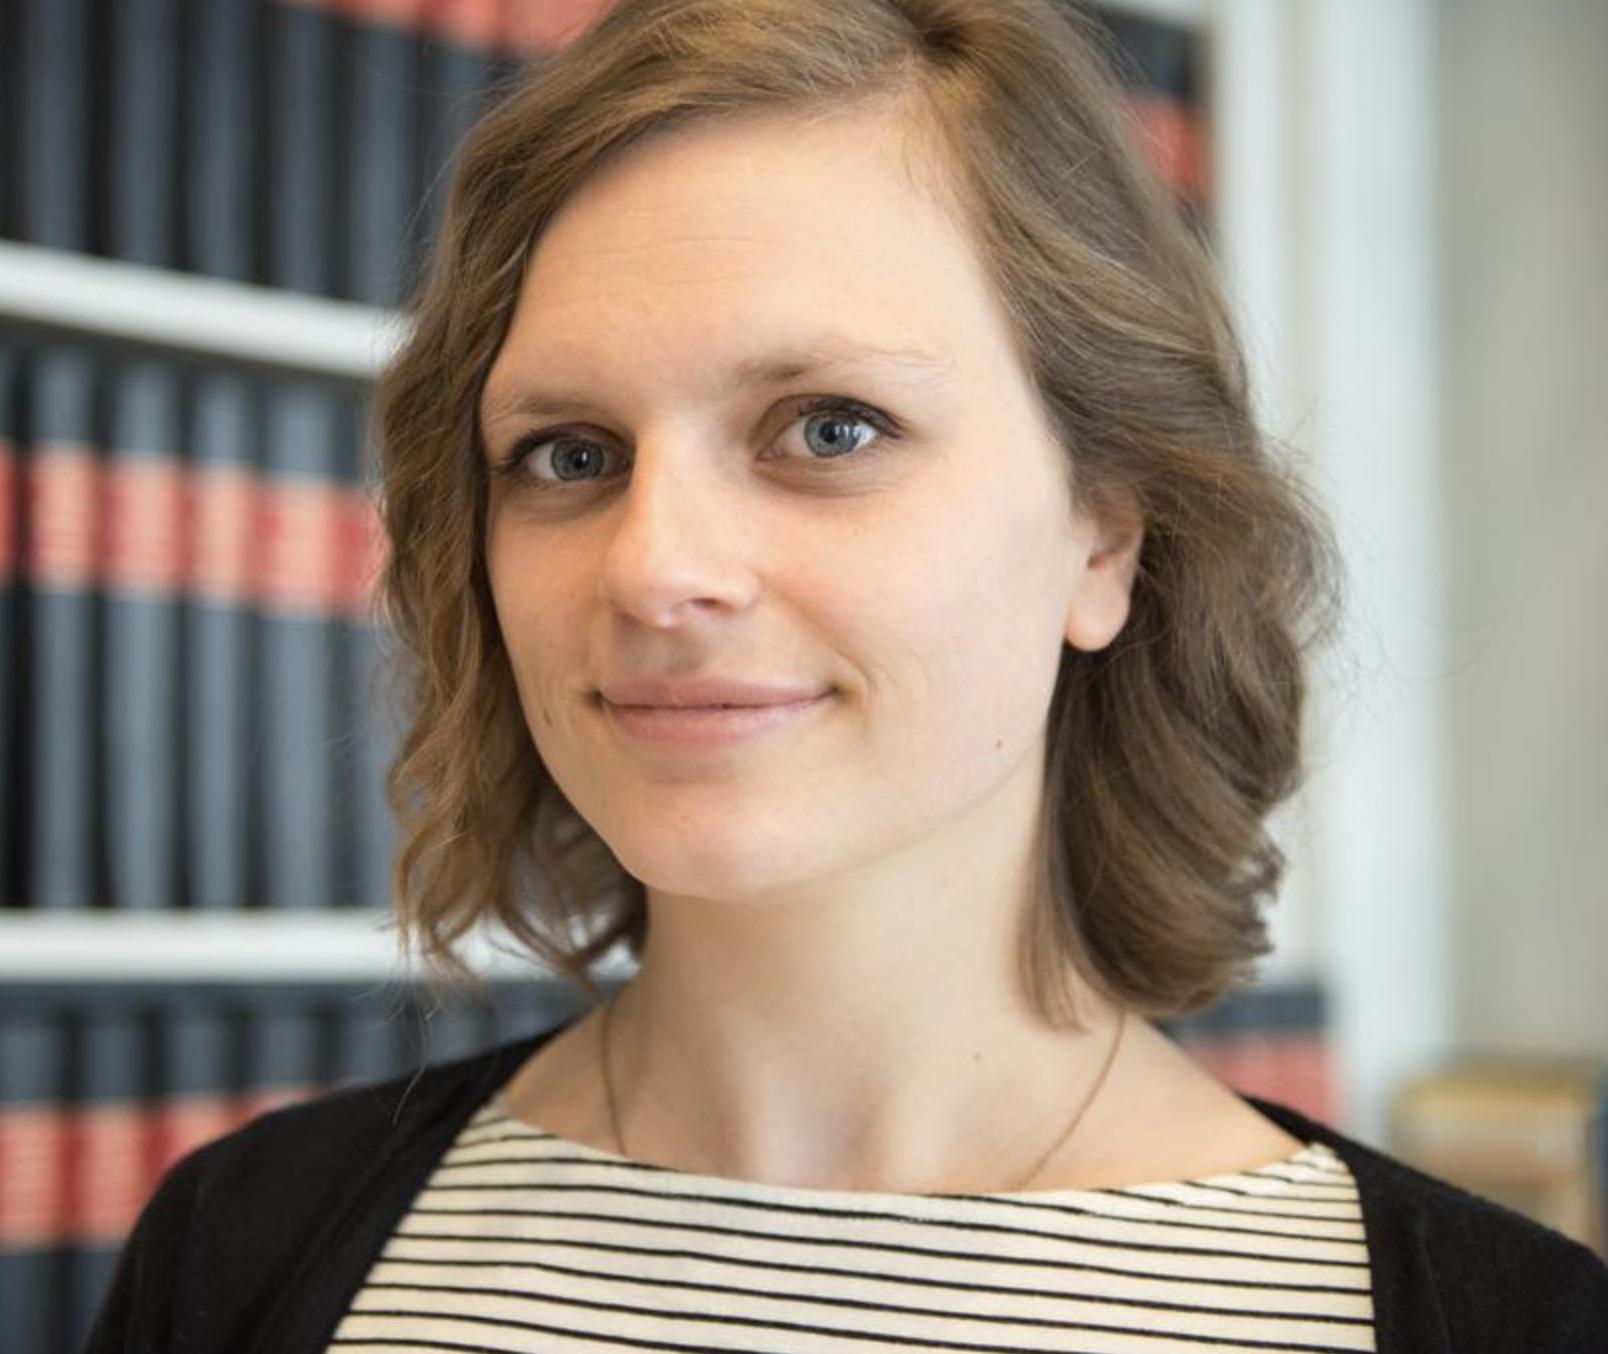 Nathalie Van Raemdonck